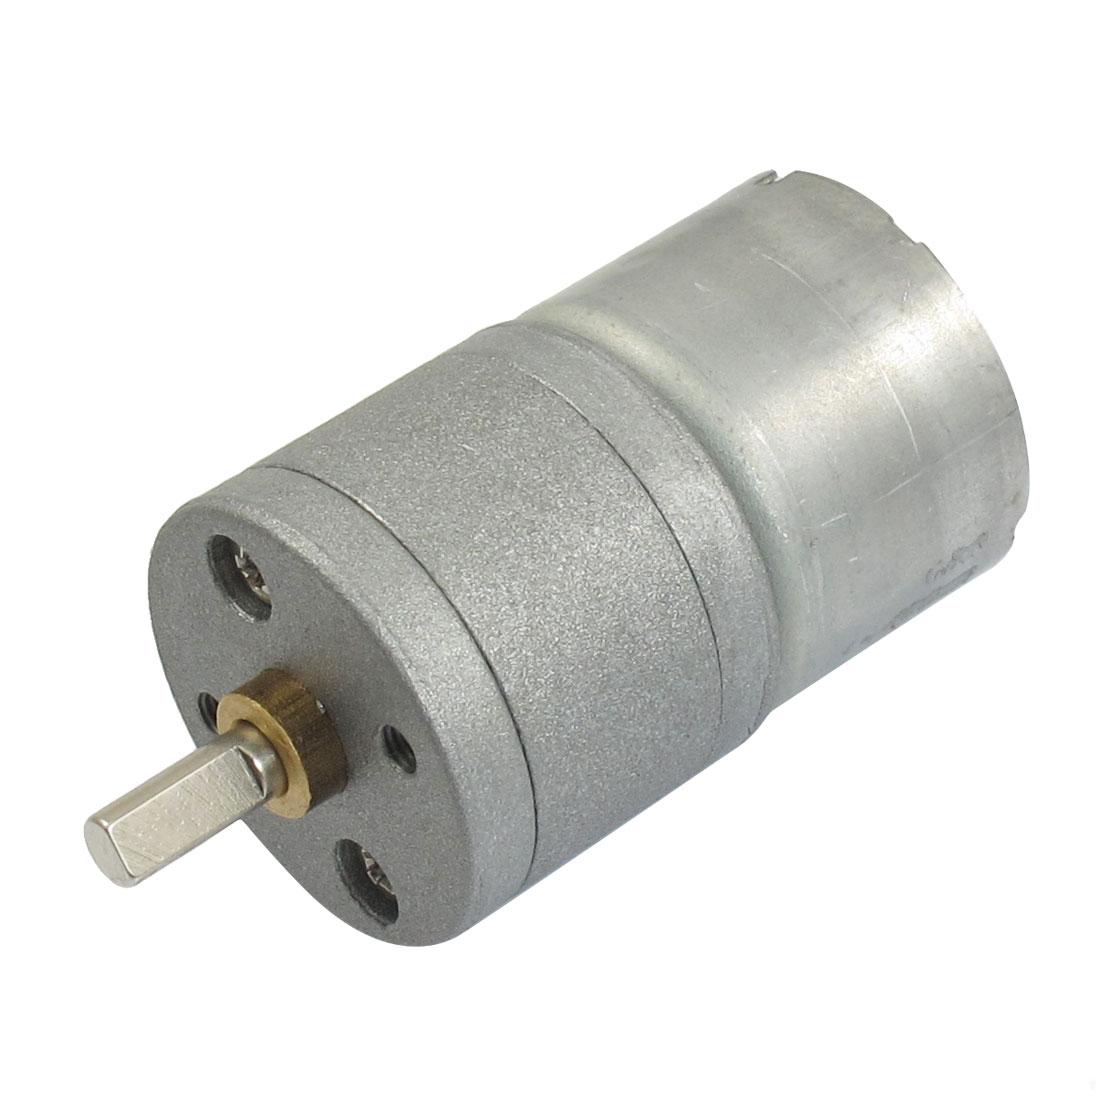 Repairing Part 4mm Shaft Dia DC 3V 60RPM 0.5A 25GA Electric Geared Motor